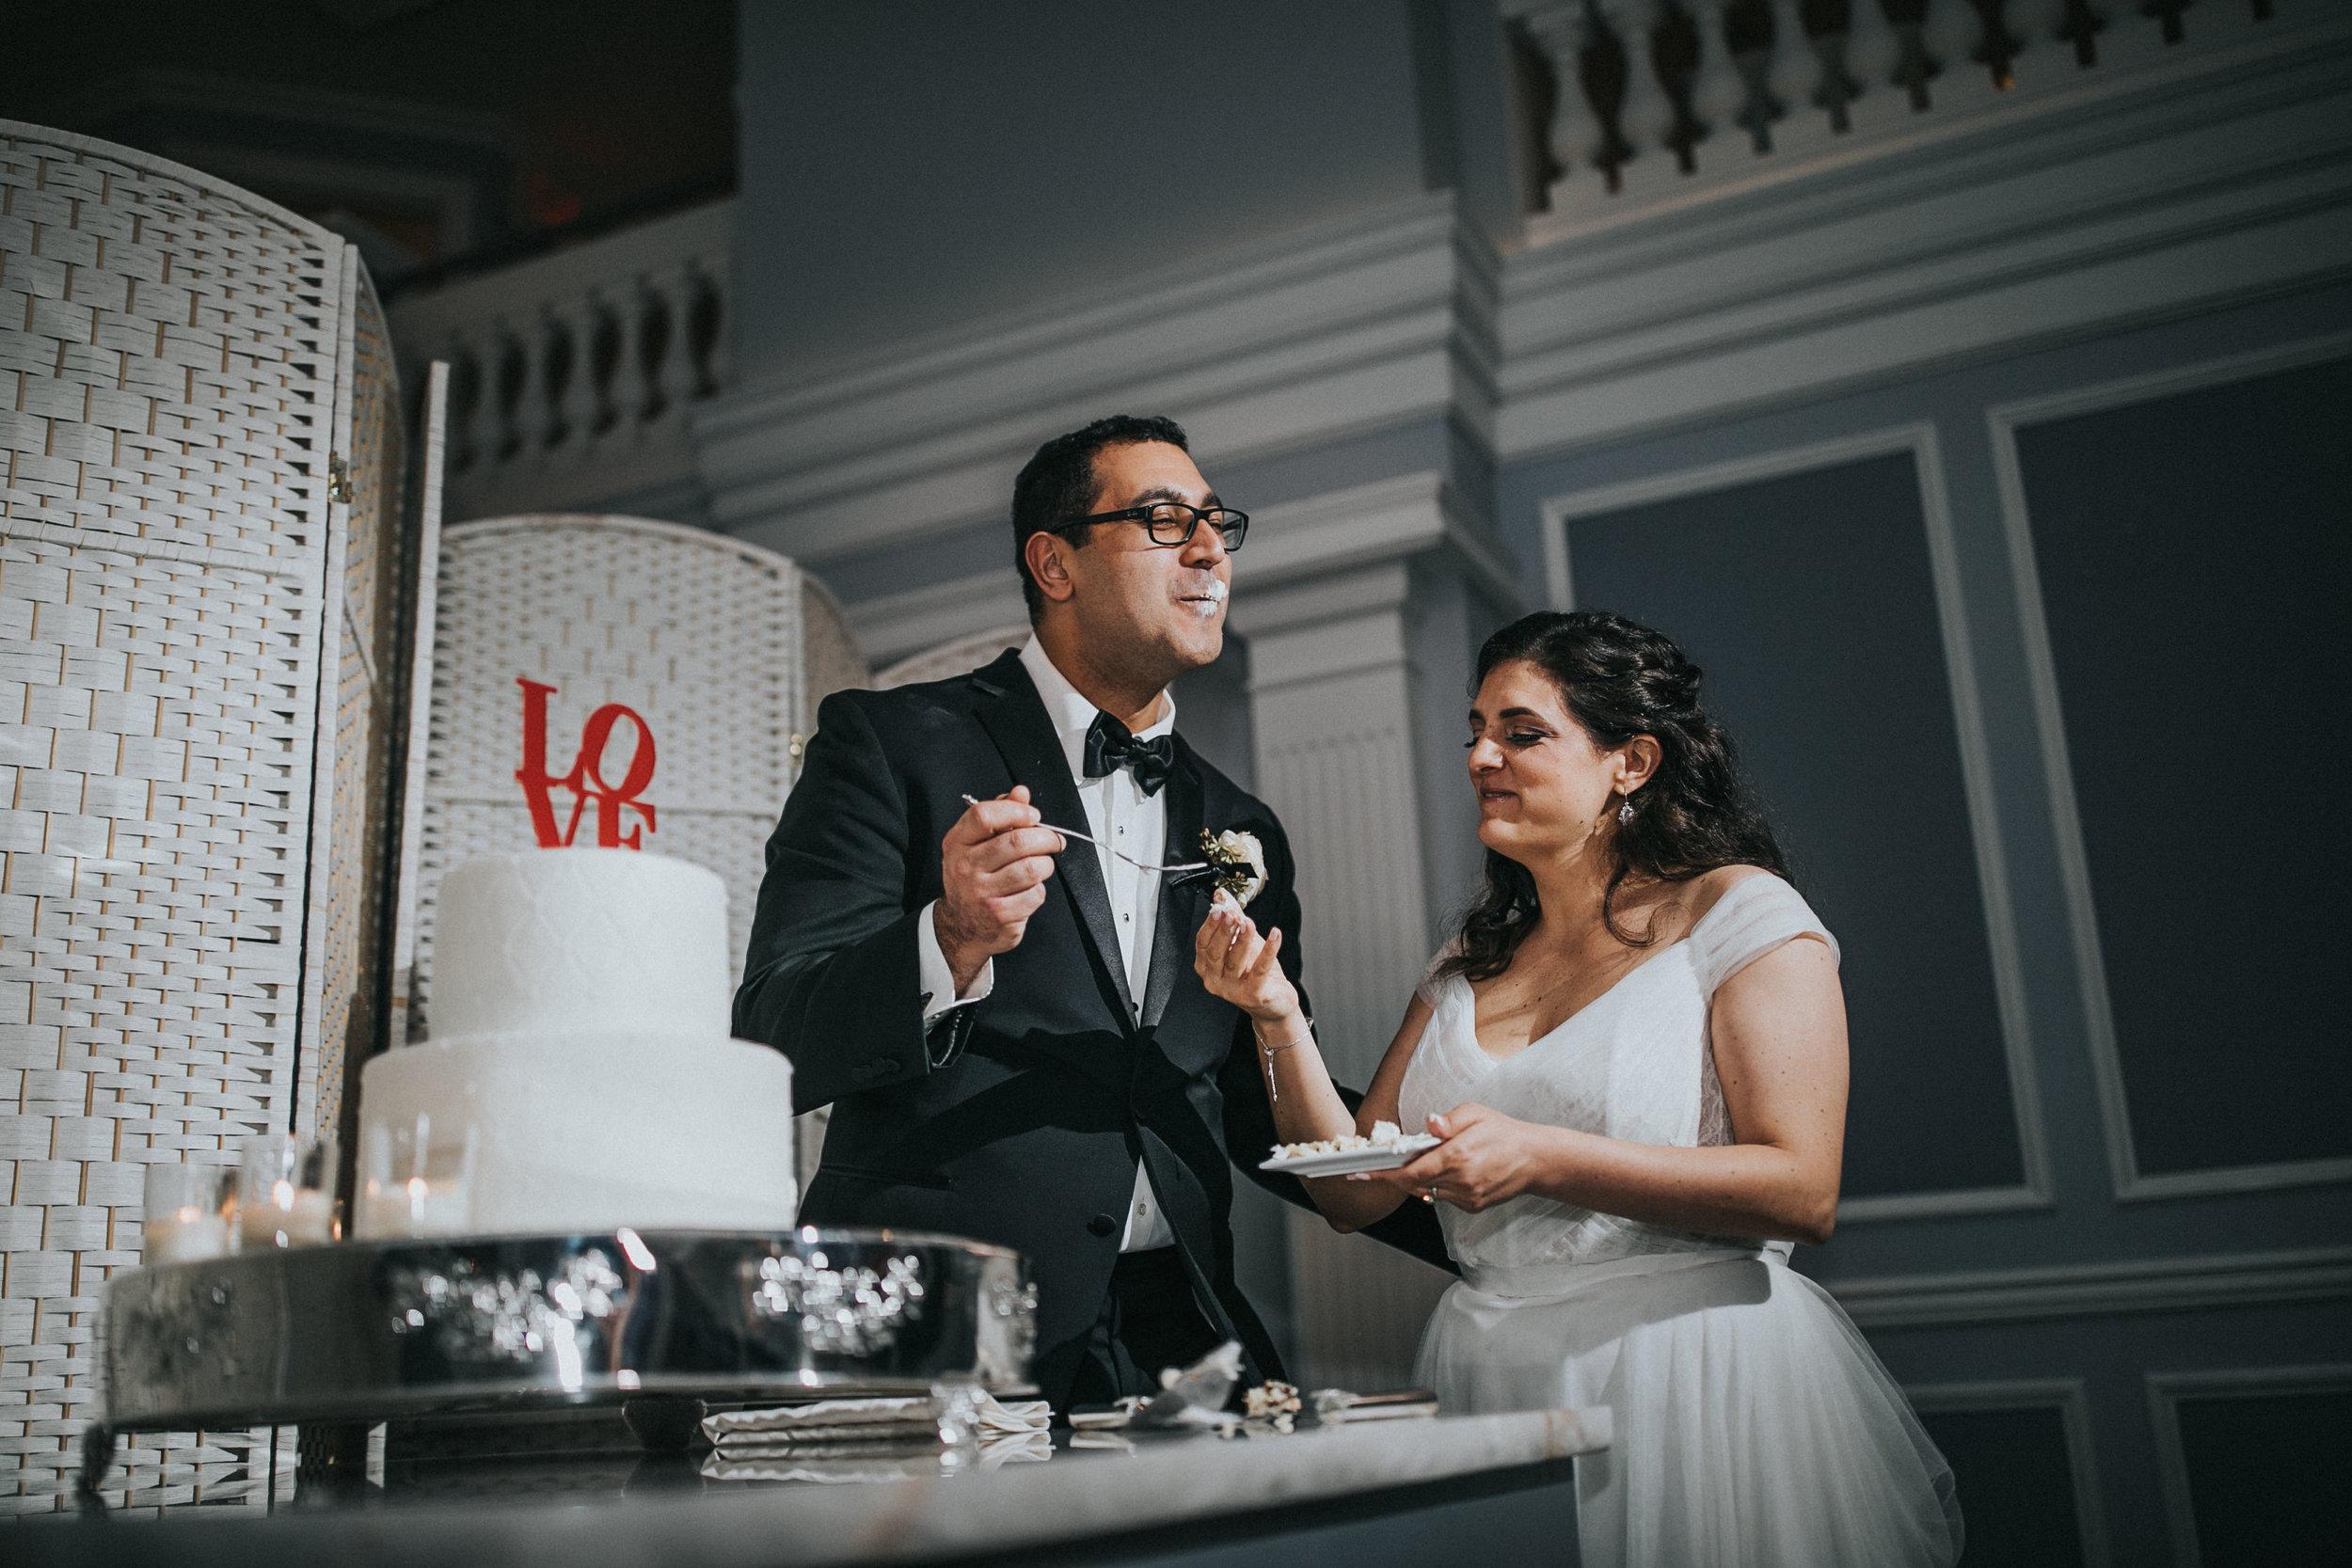 JennaLynnPhotography-NJWeddingPhotographer-Philadelphia-Wedding-ArtsBallroom-Reception-192.jpg